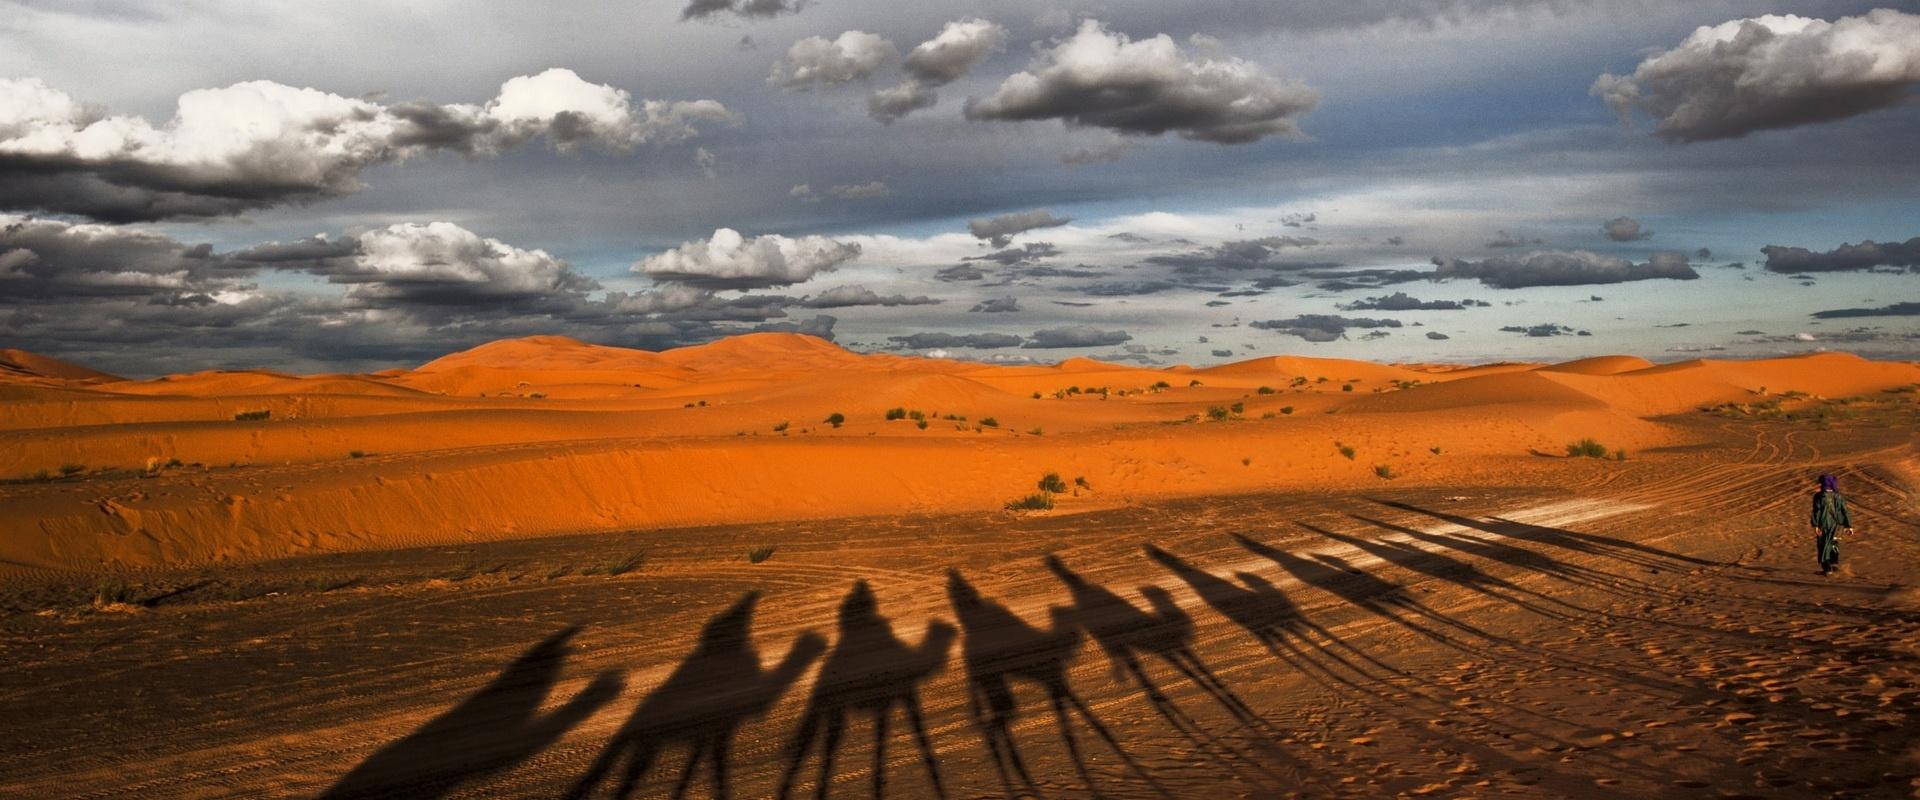 Voyages Expeditions Maroc - dunes de merzouga